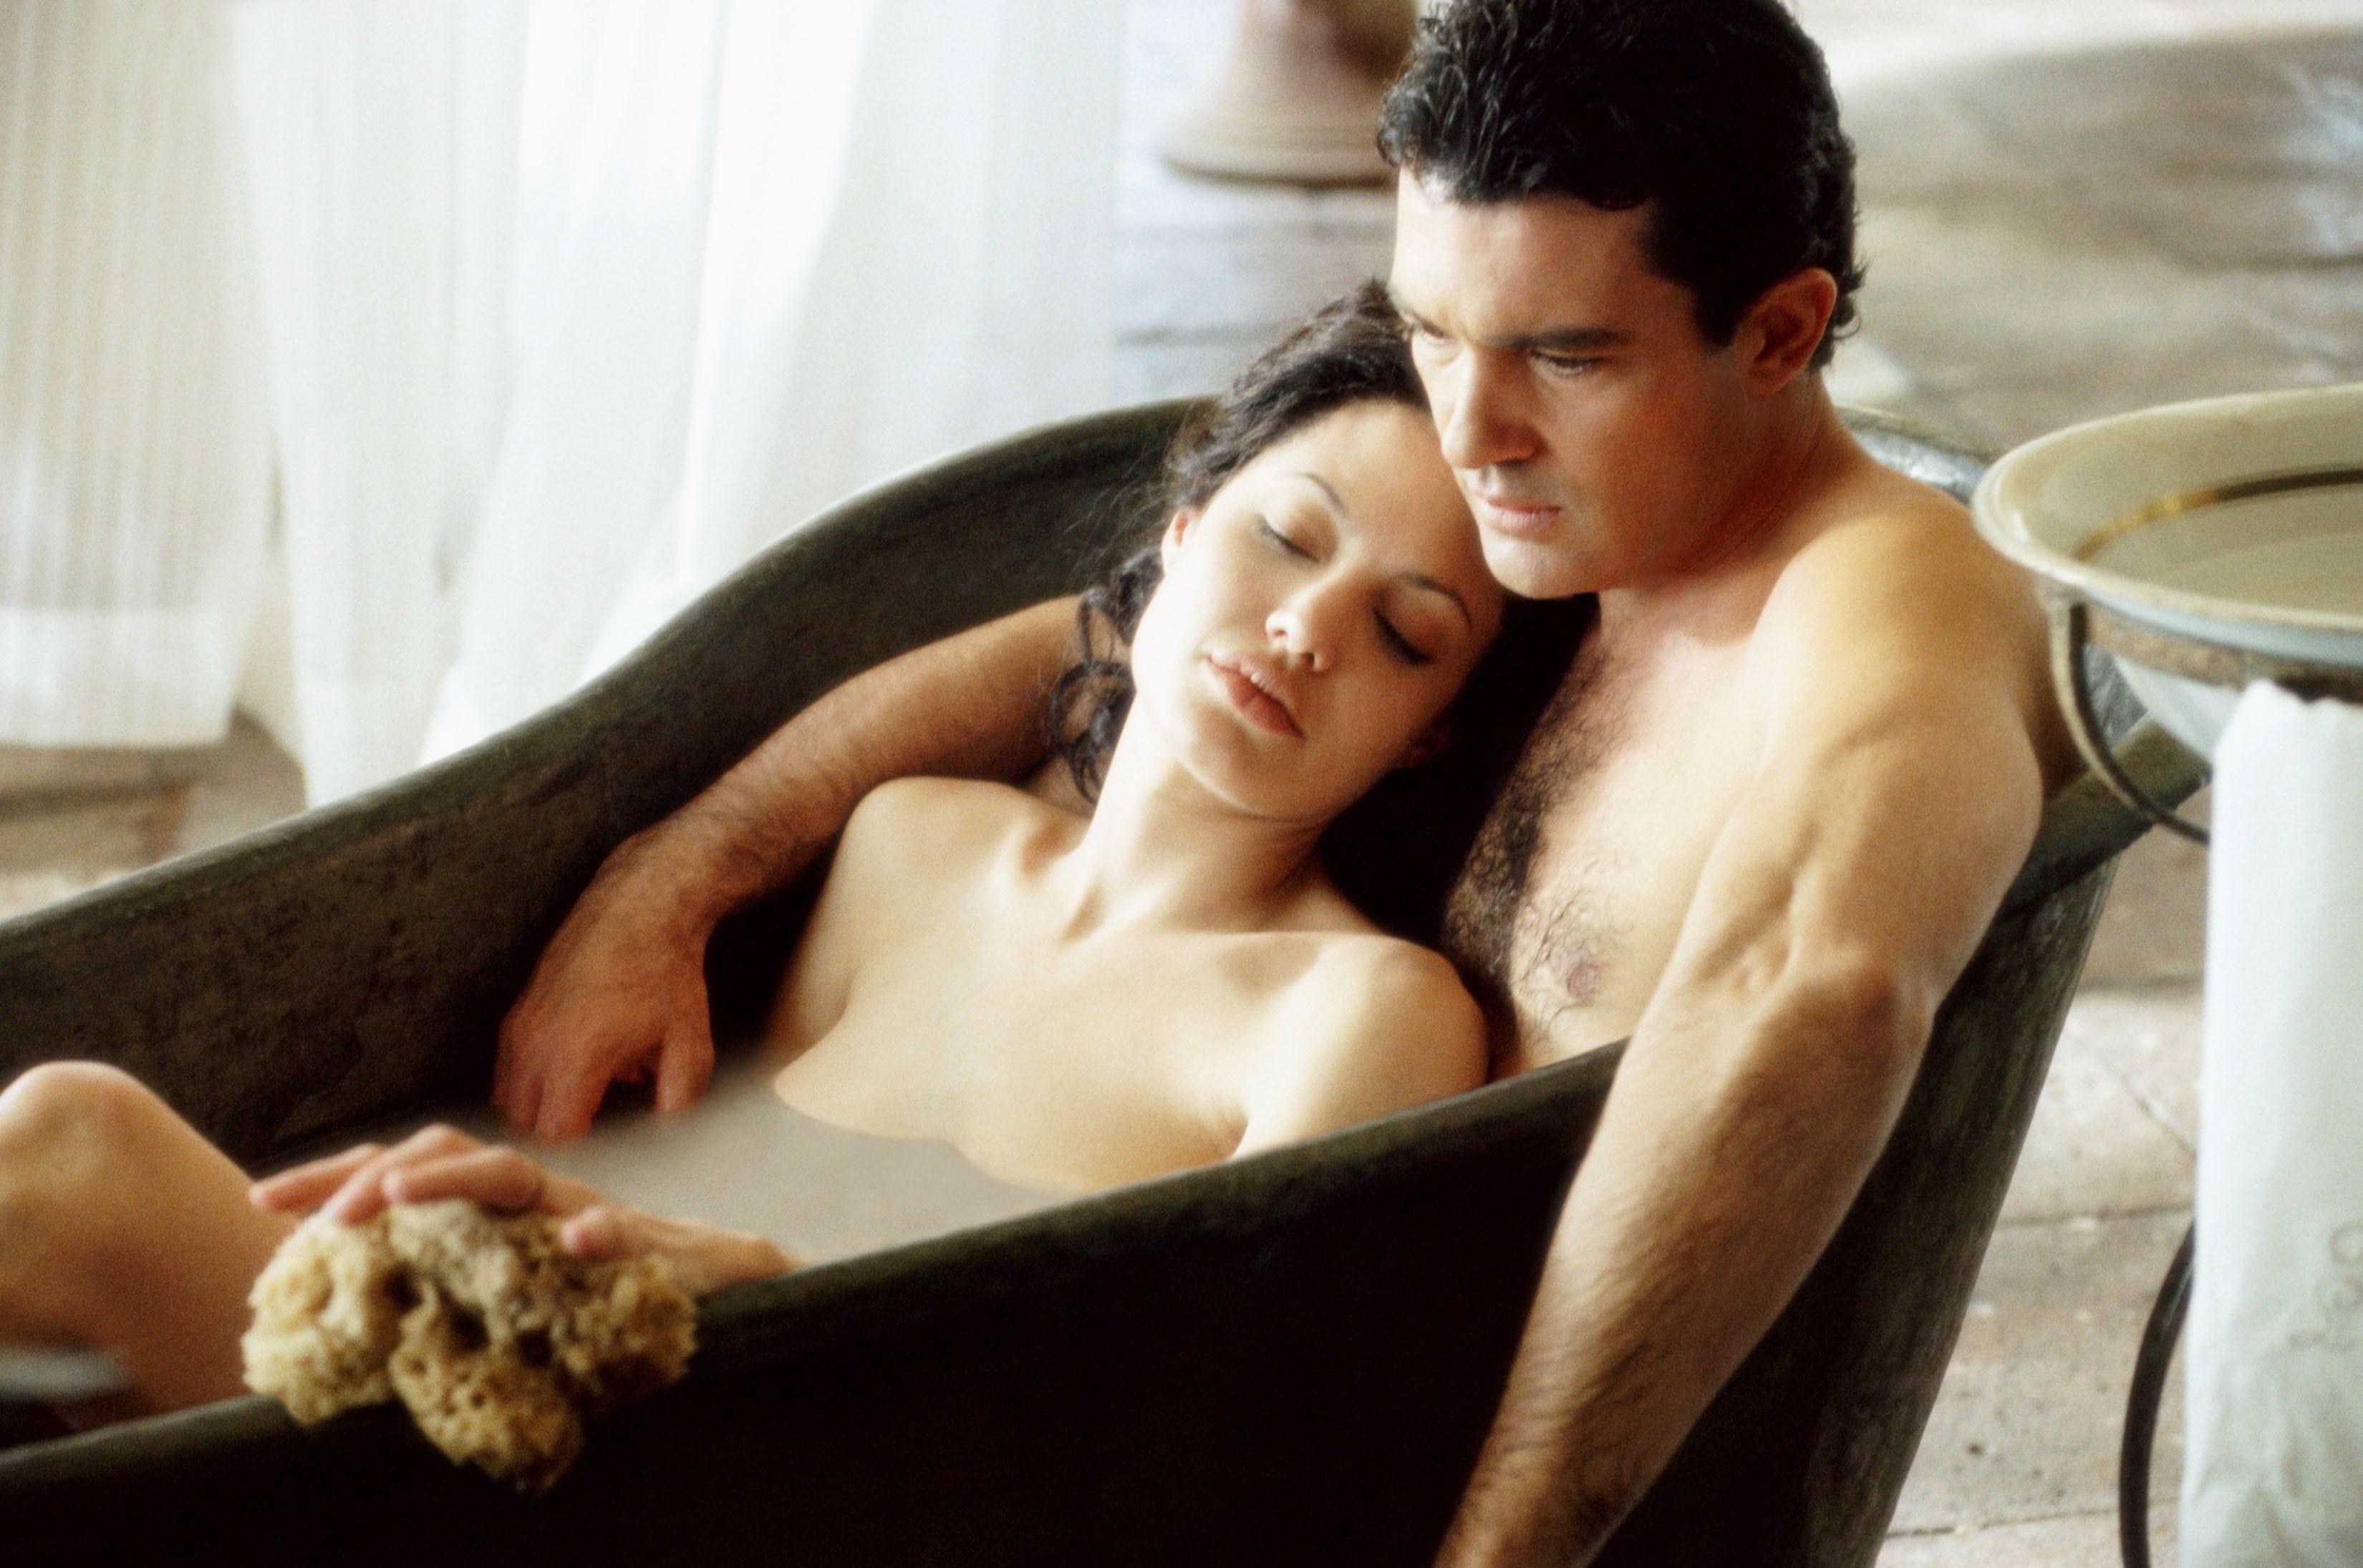 Angelina Jolie Sexi Movie sexiest movies 50 shades of grey alternatives